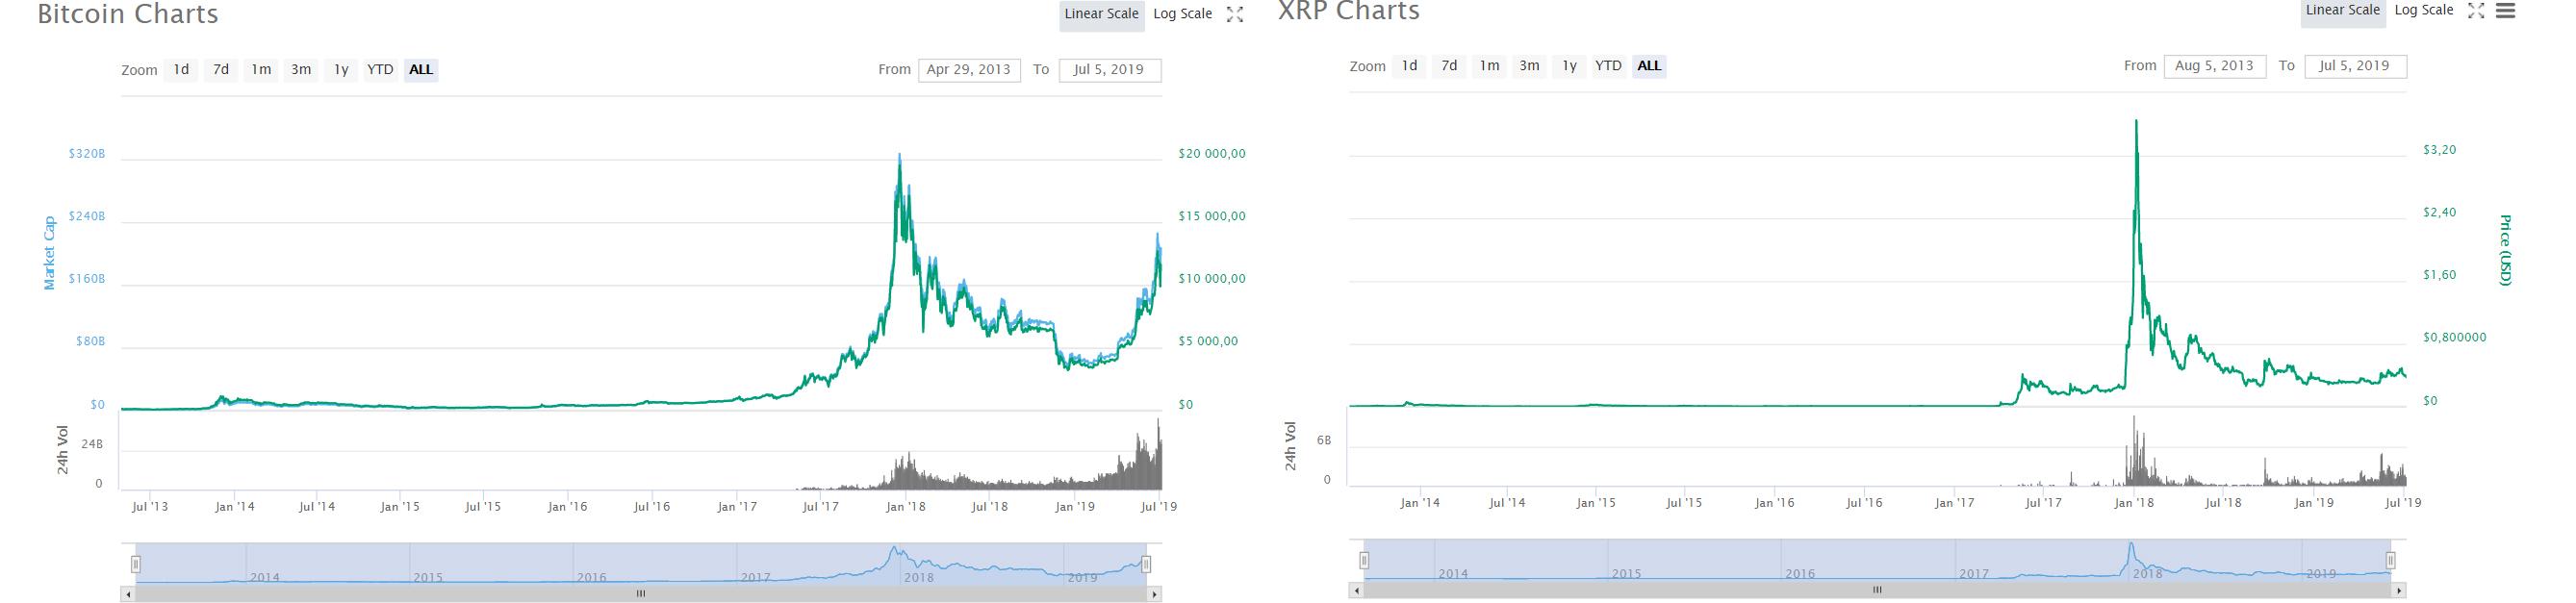 CEO Ripple объяснил причину продаж больших объемов XRP